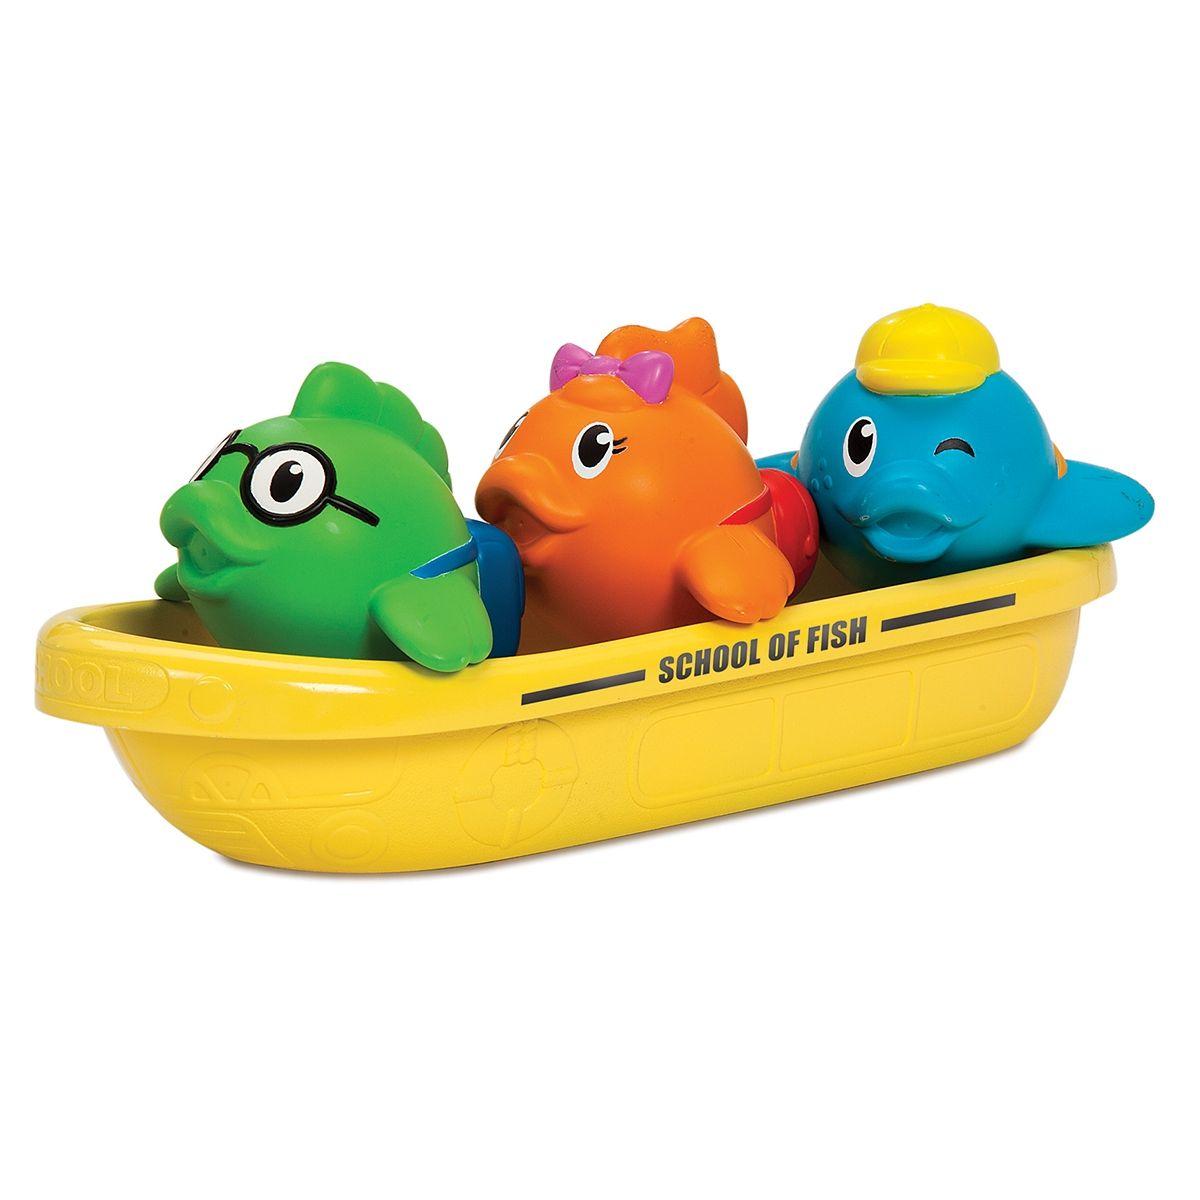 Badelegetøj fra Munchkin - School of Fish